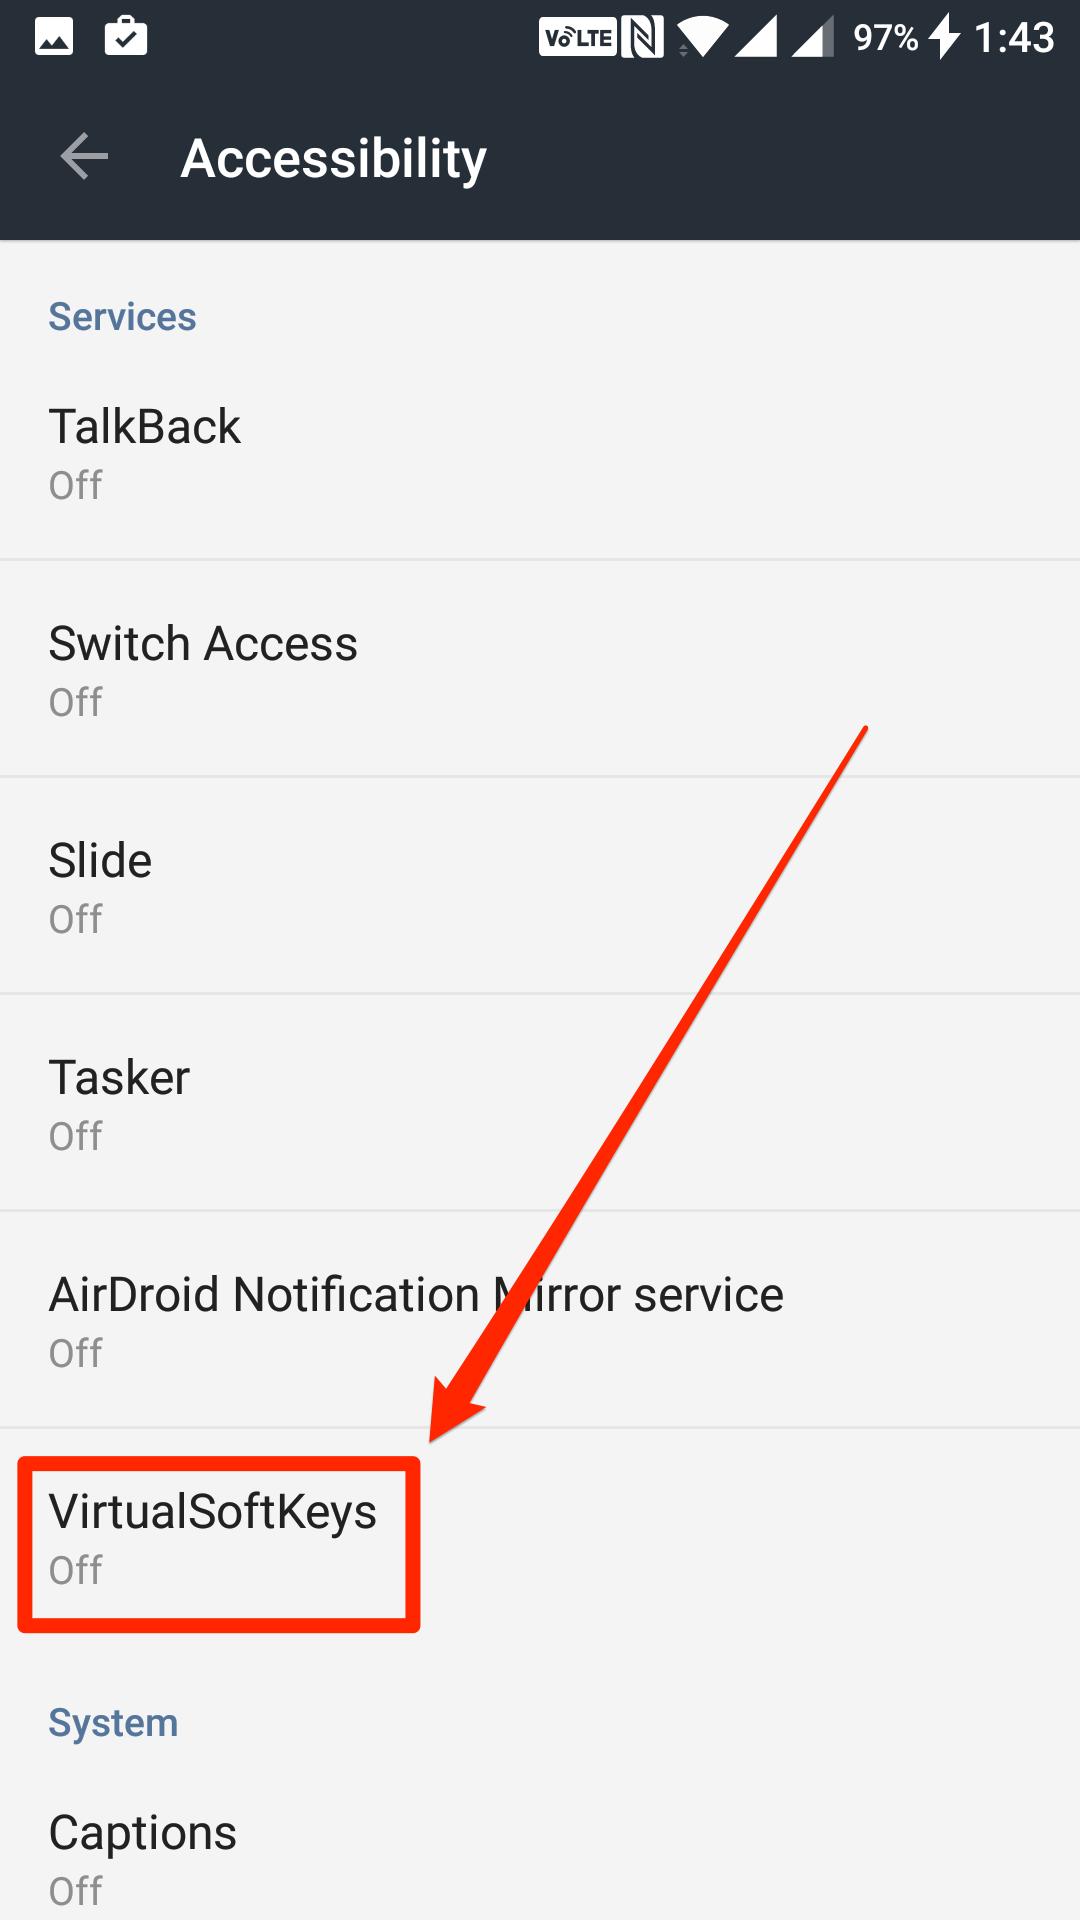 navigation-bar-services